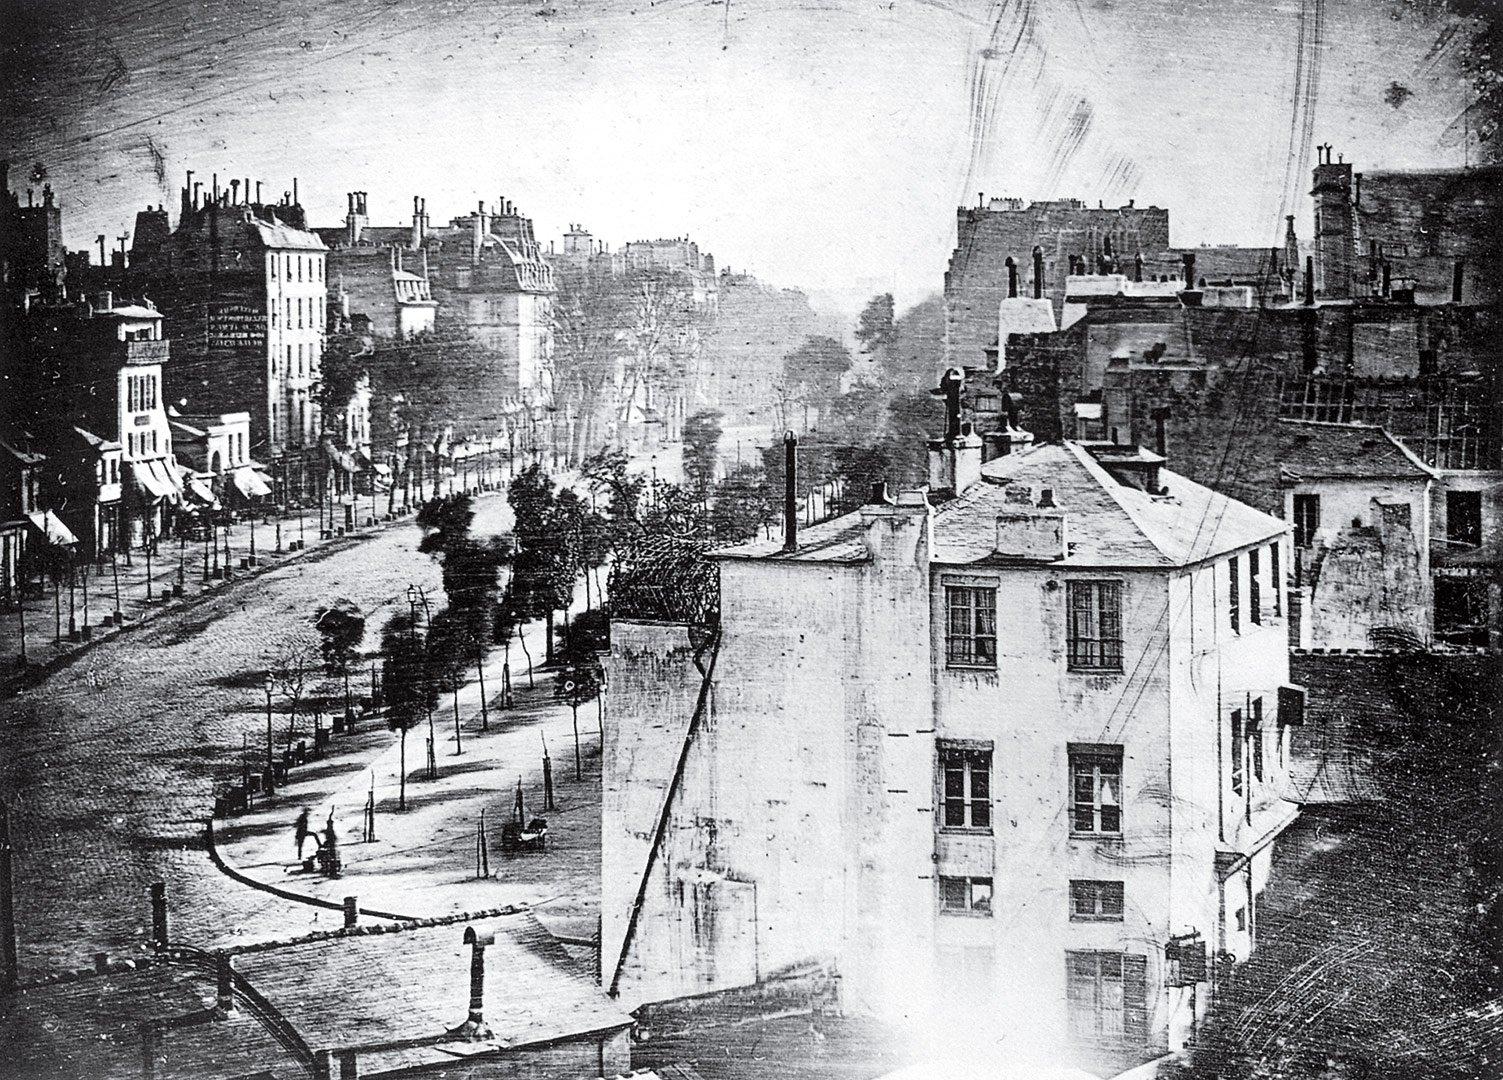 Boulevard du Temple, Paris, Frankreich, 1839 © Louis Daguerre Geschichte der Landschaftsfotografie